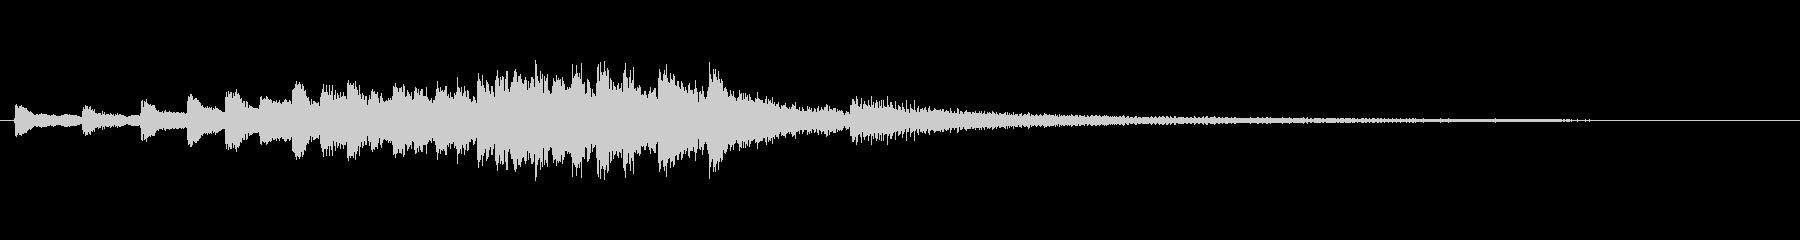 Dialogue3の未再生の波形